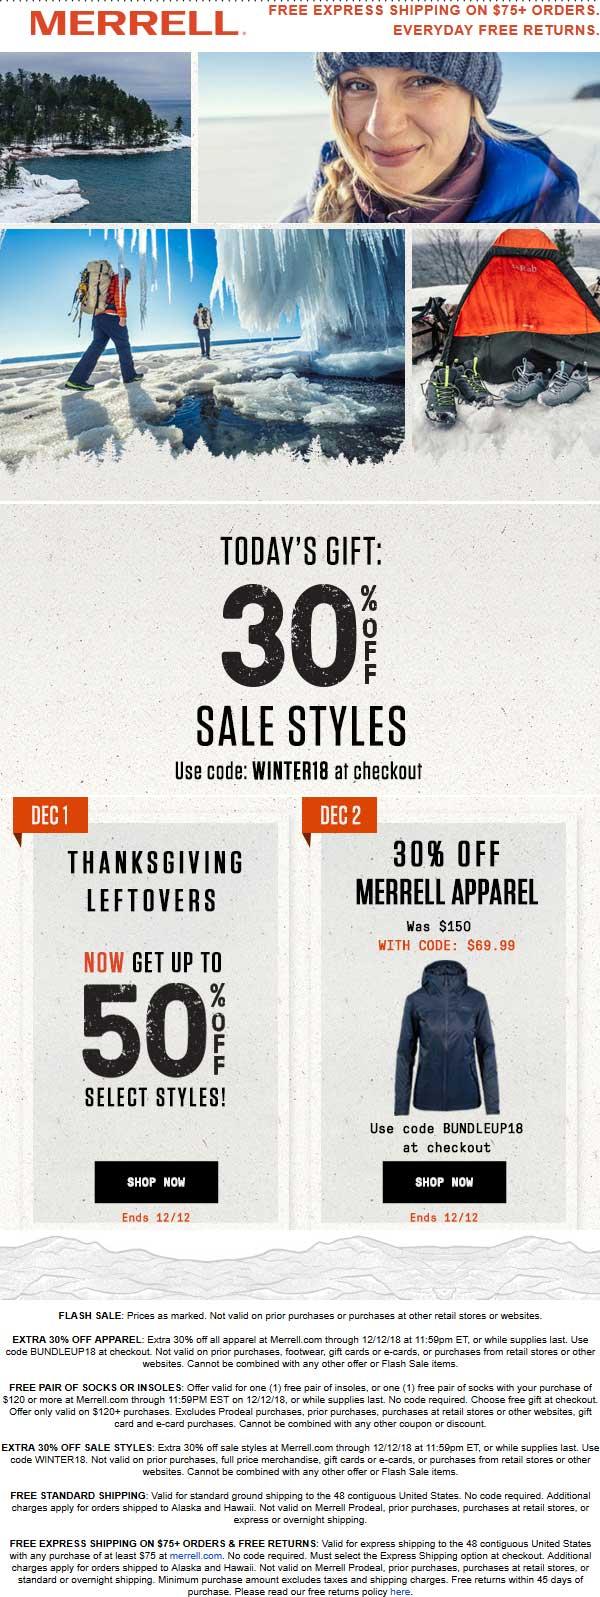 Merrell Coupon May 2020 Extra 30% off sale items online at Merrell via promo code BUNDLEUP18